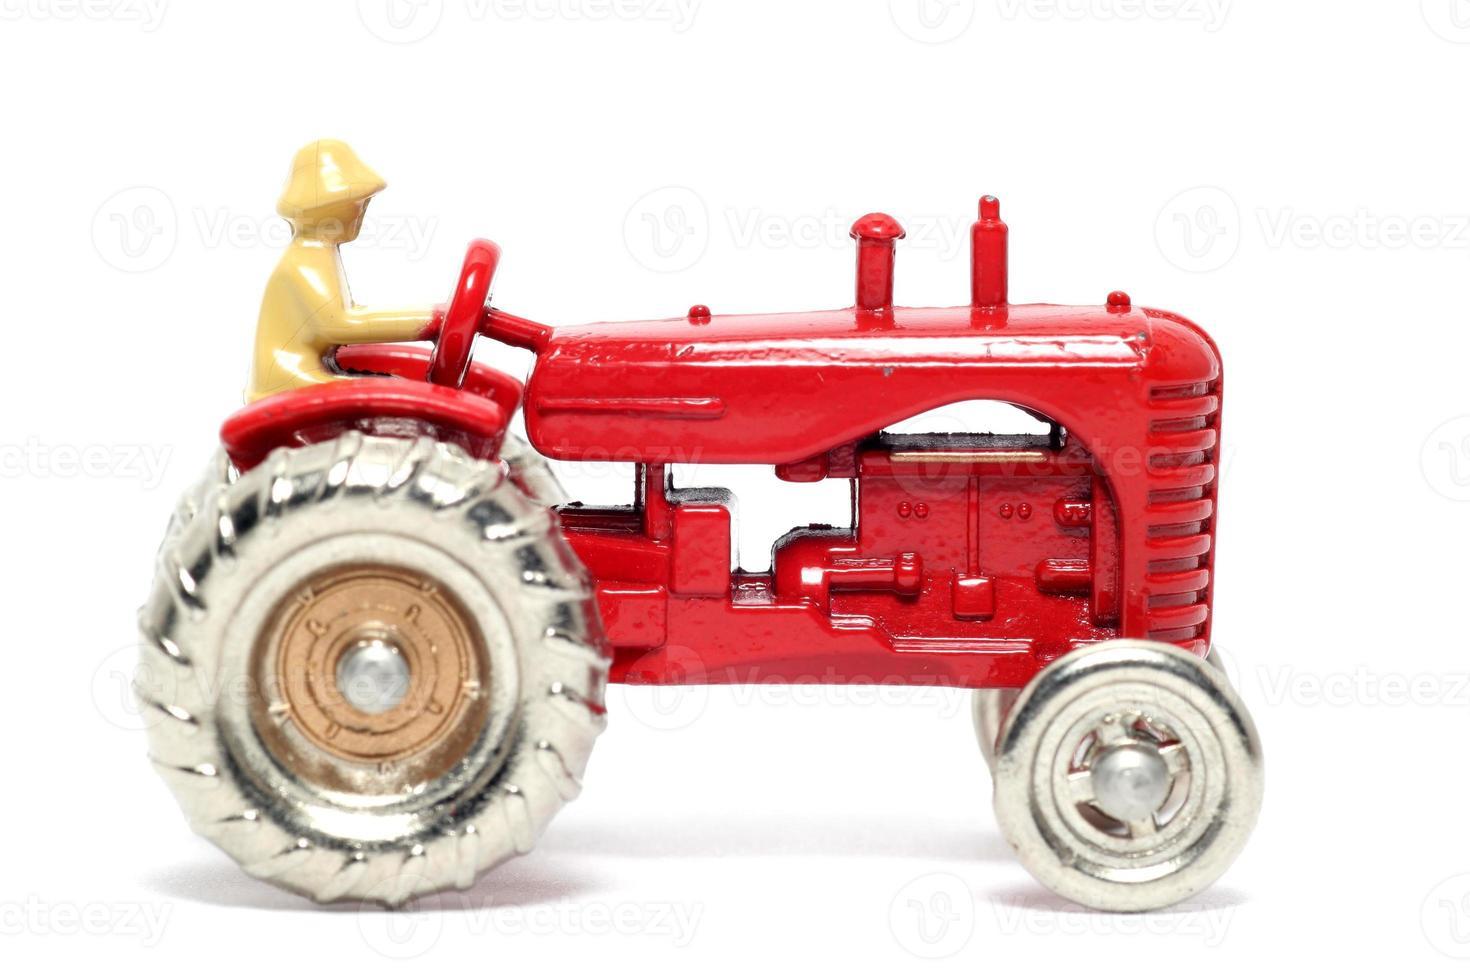 vieux jouet voiture massey harris tracteur photo